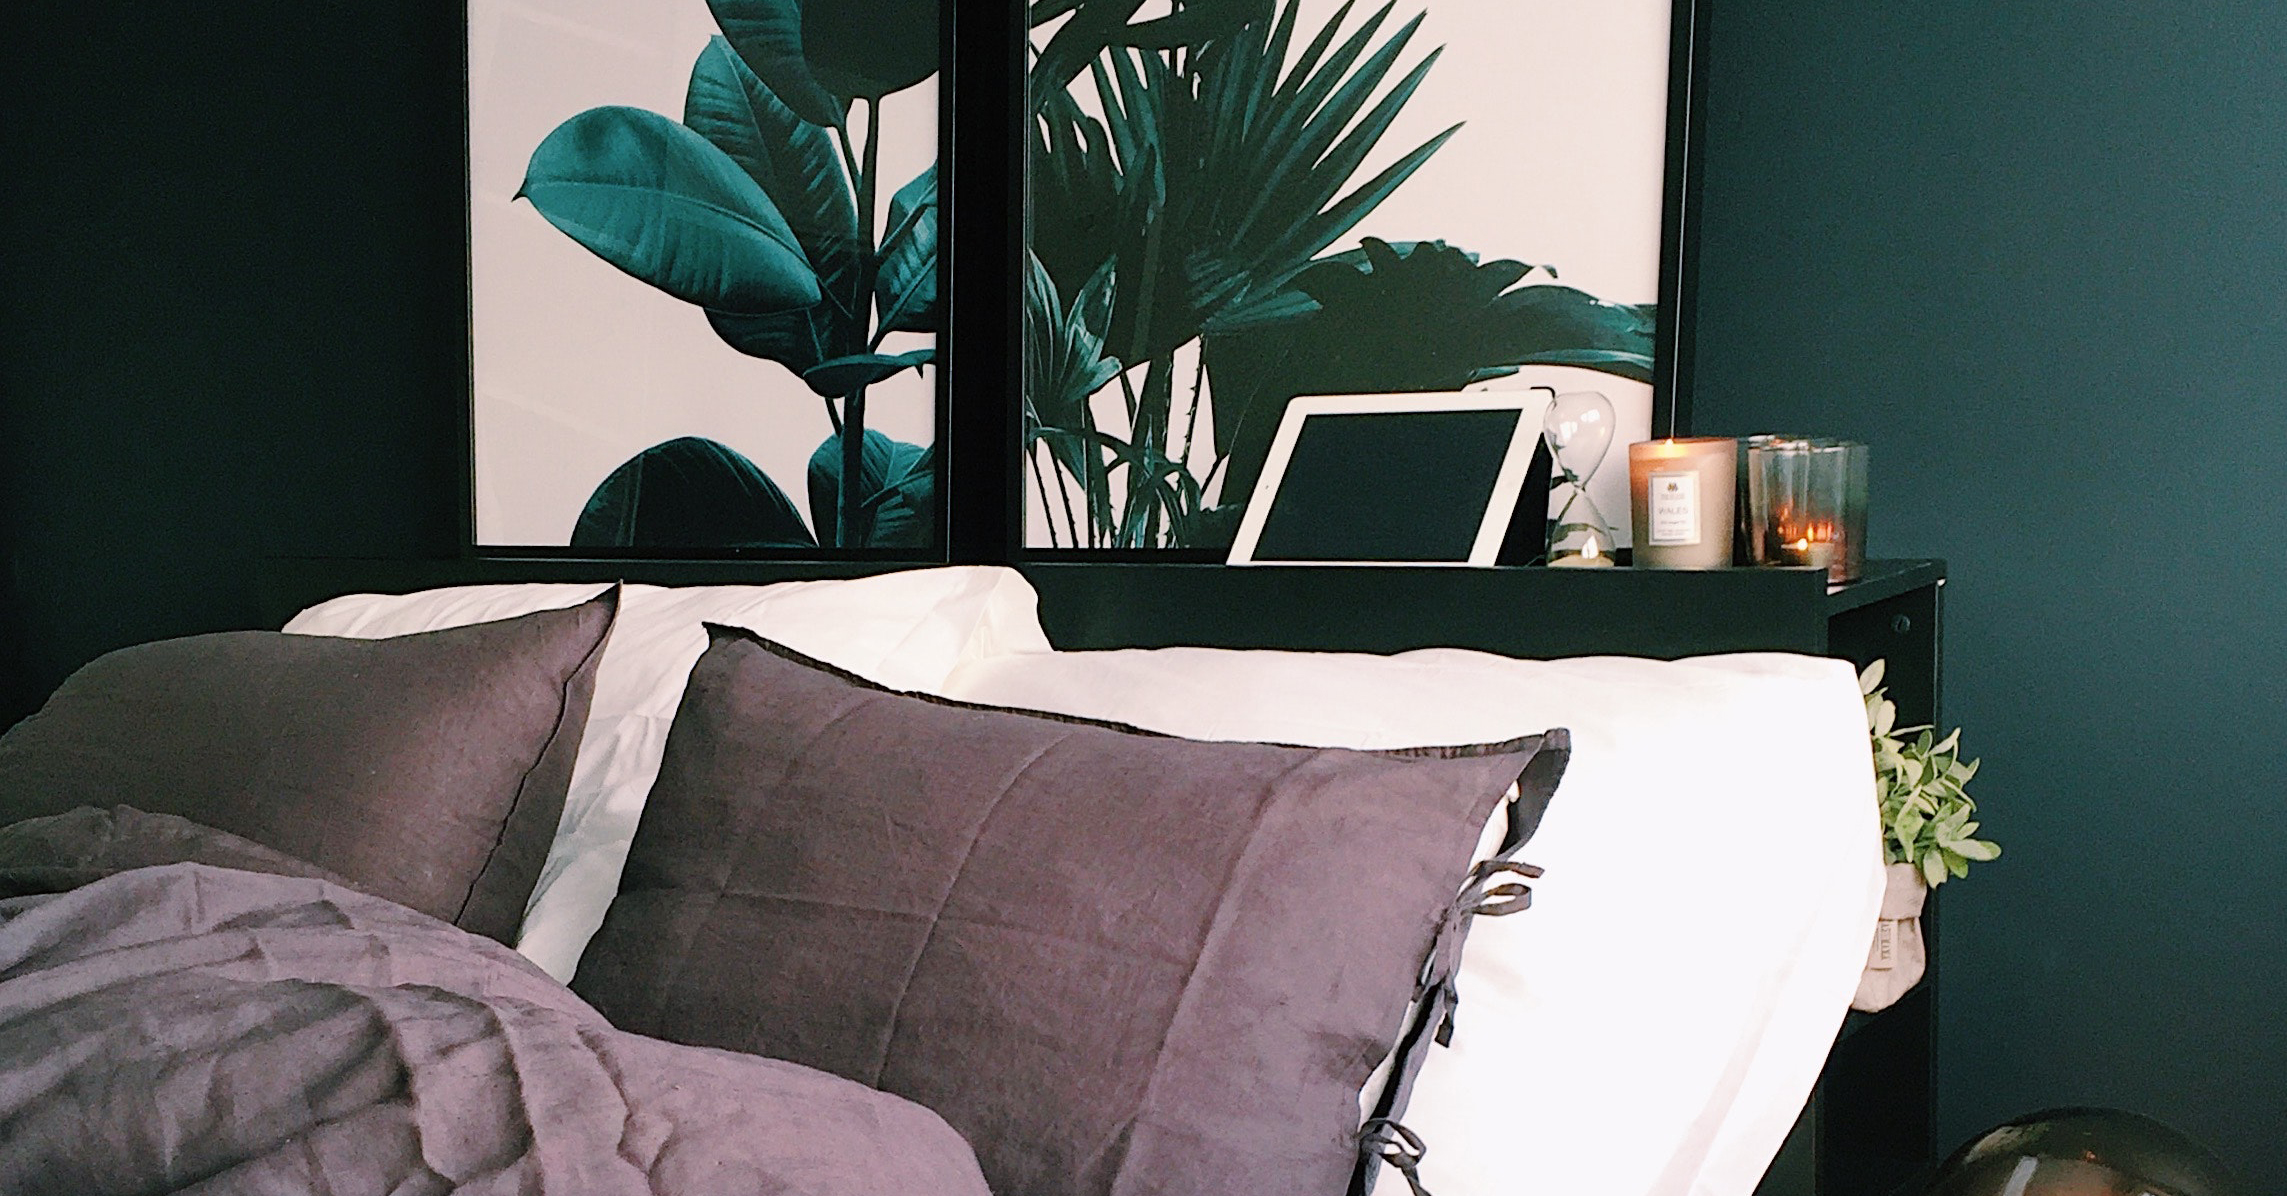 https://assets.boxdice.com.au/laguna/attachments/3dd/d9d/bed_bedroom_comfort_1374125crop.jpg?8242728dff7a92ce9dc77526c649f735